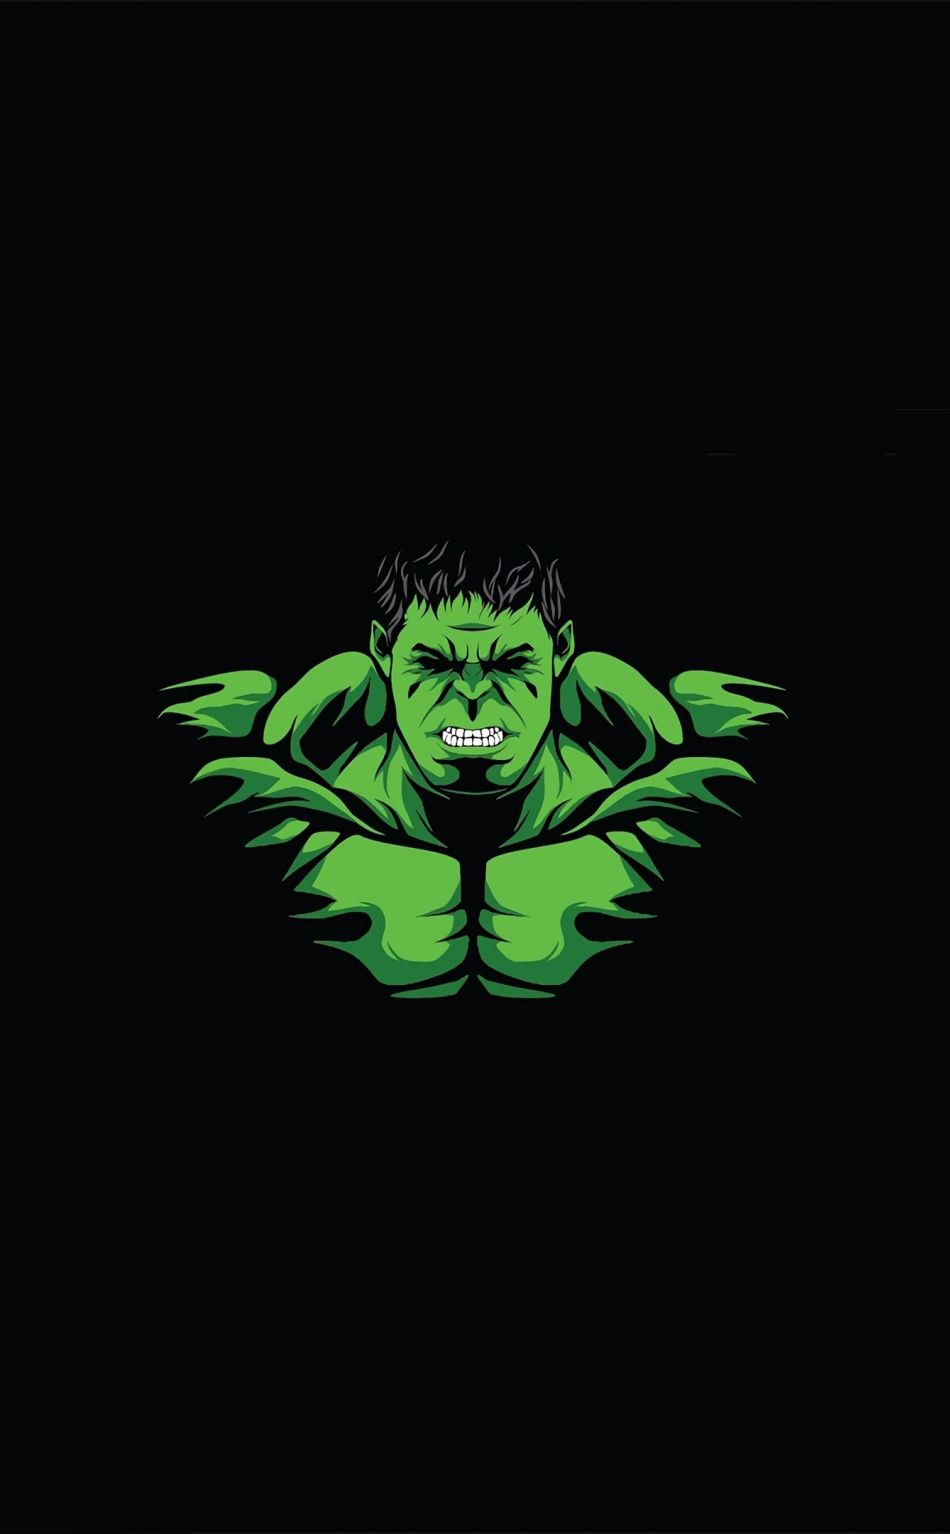 950x1534 Hulk Angry Green Man Minimal Wallpaper Hulk Art Cartoon Wallpaper Hd Cartoon Wallpaper